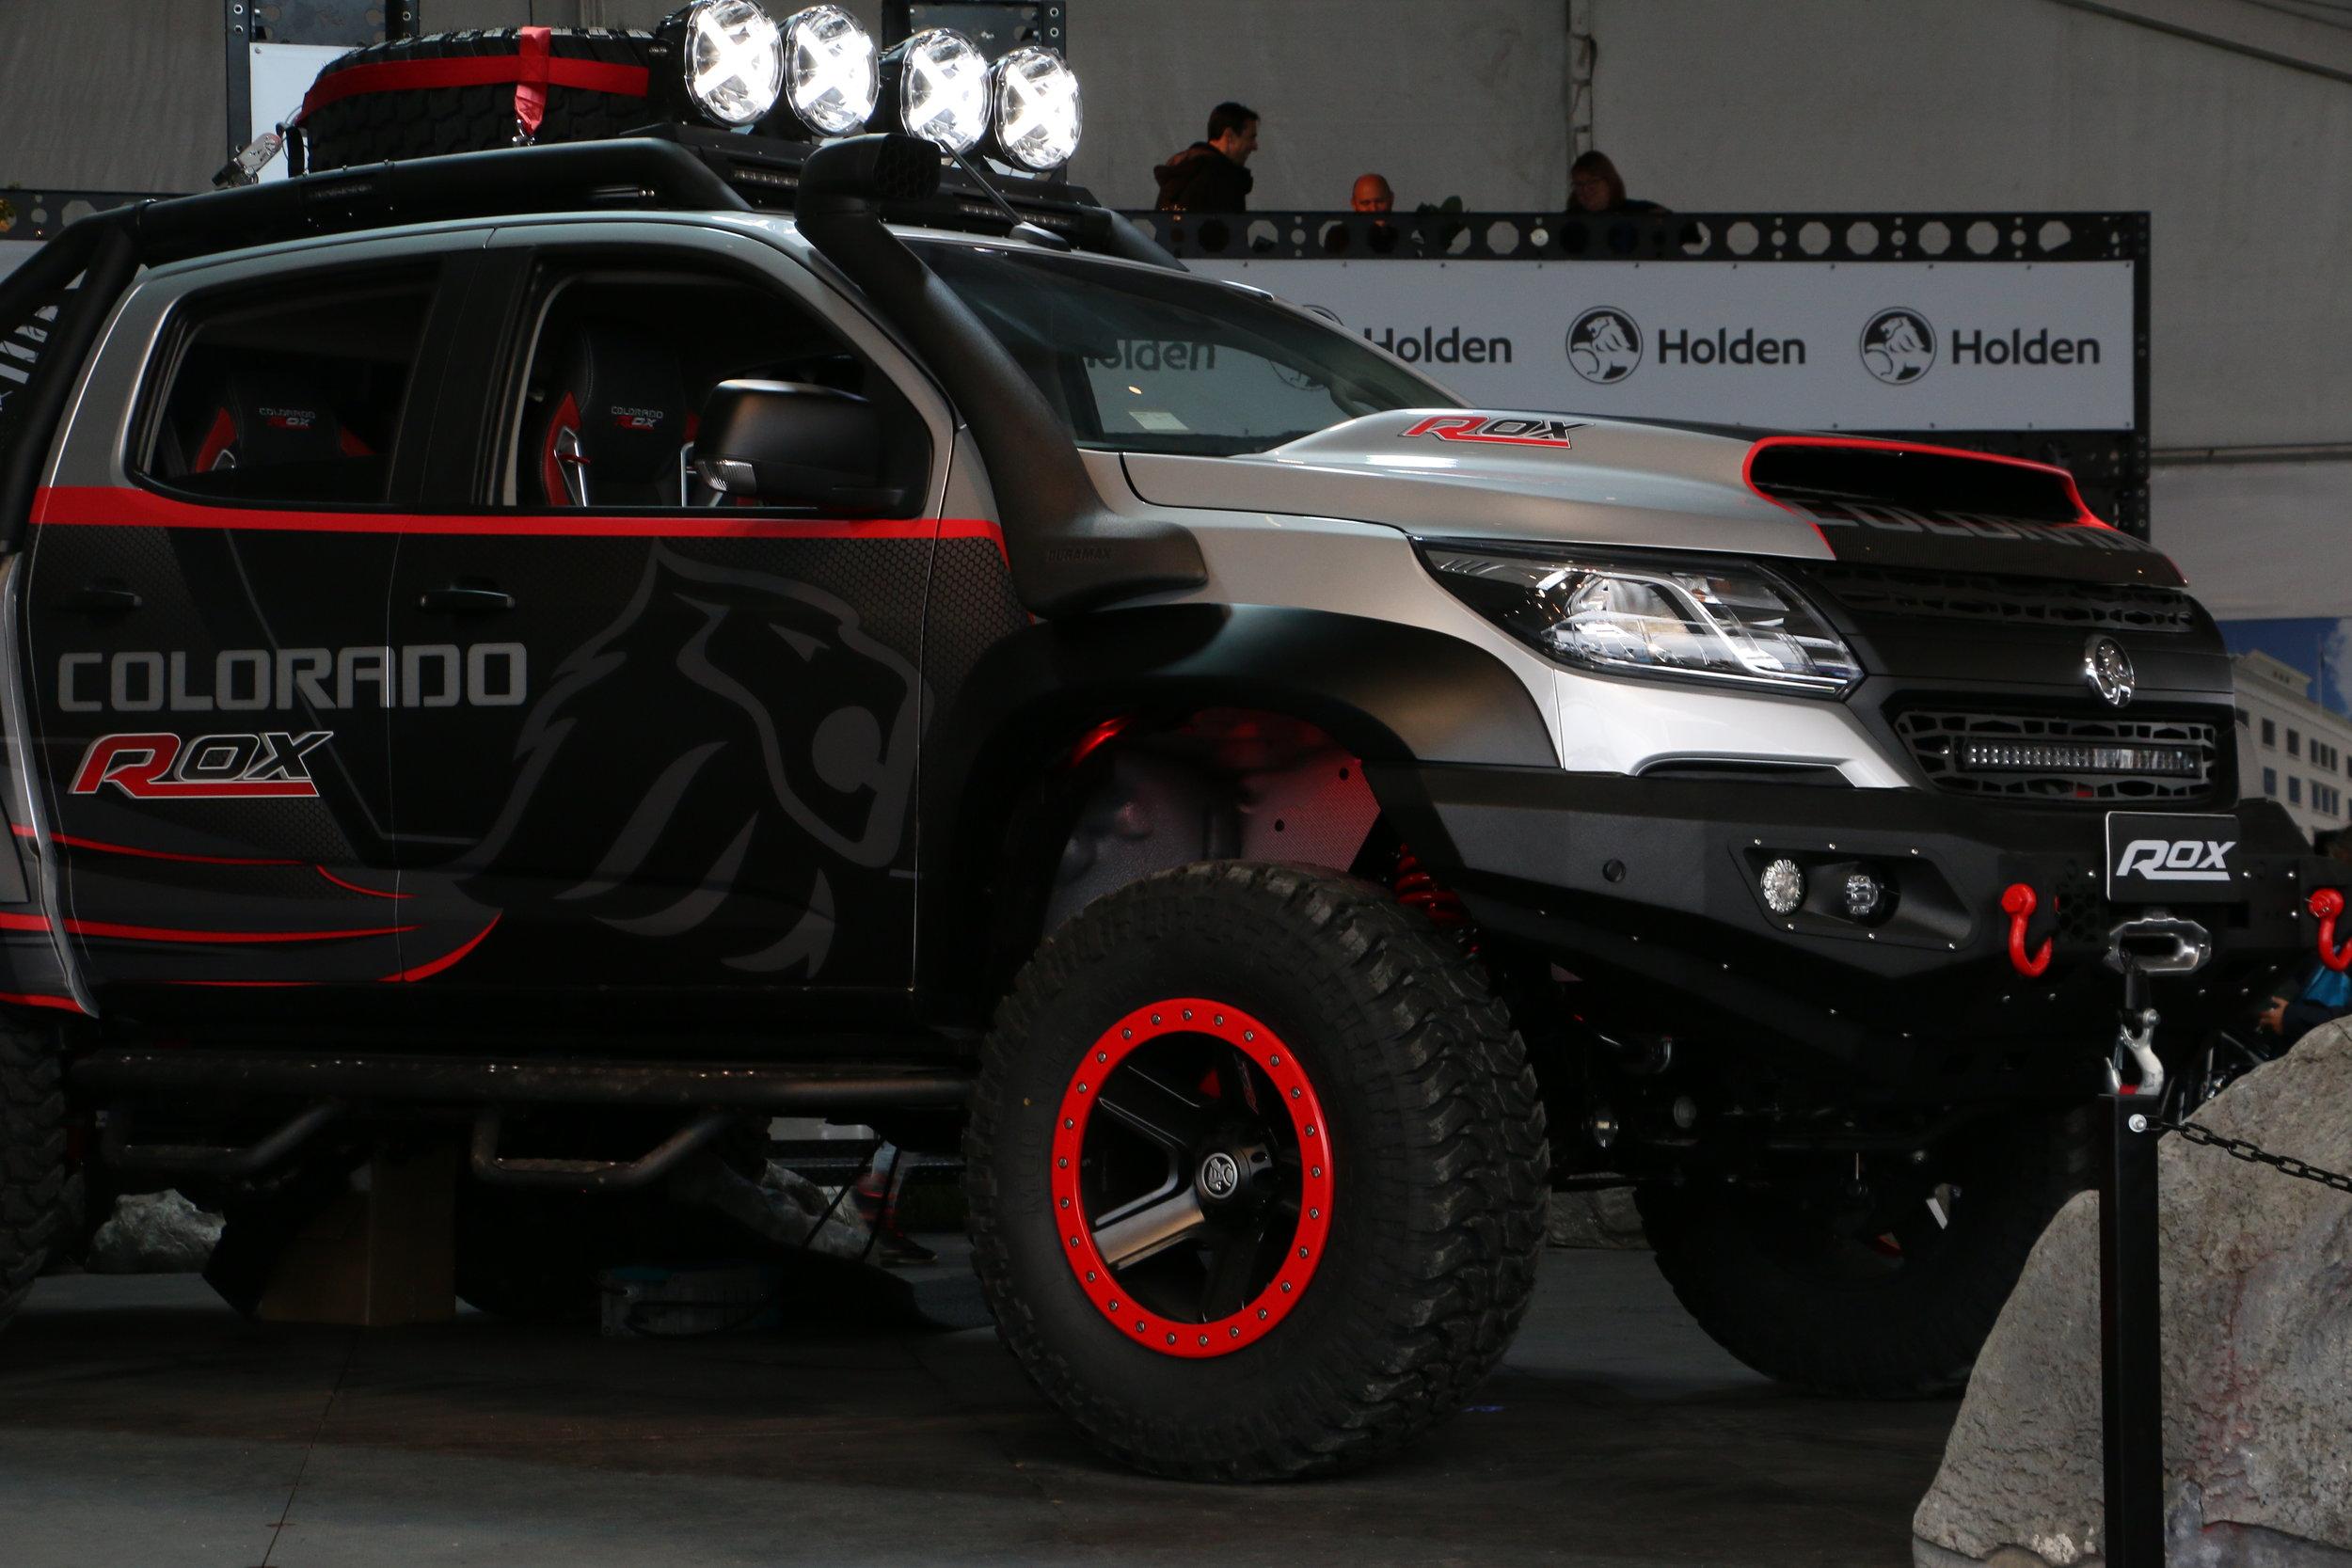 Holden Colorado Rox Concept vehicle